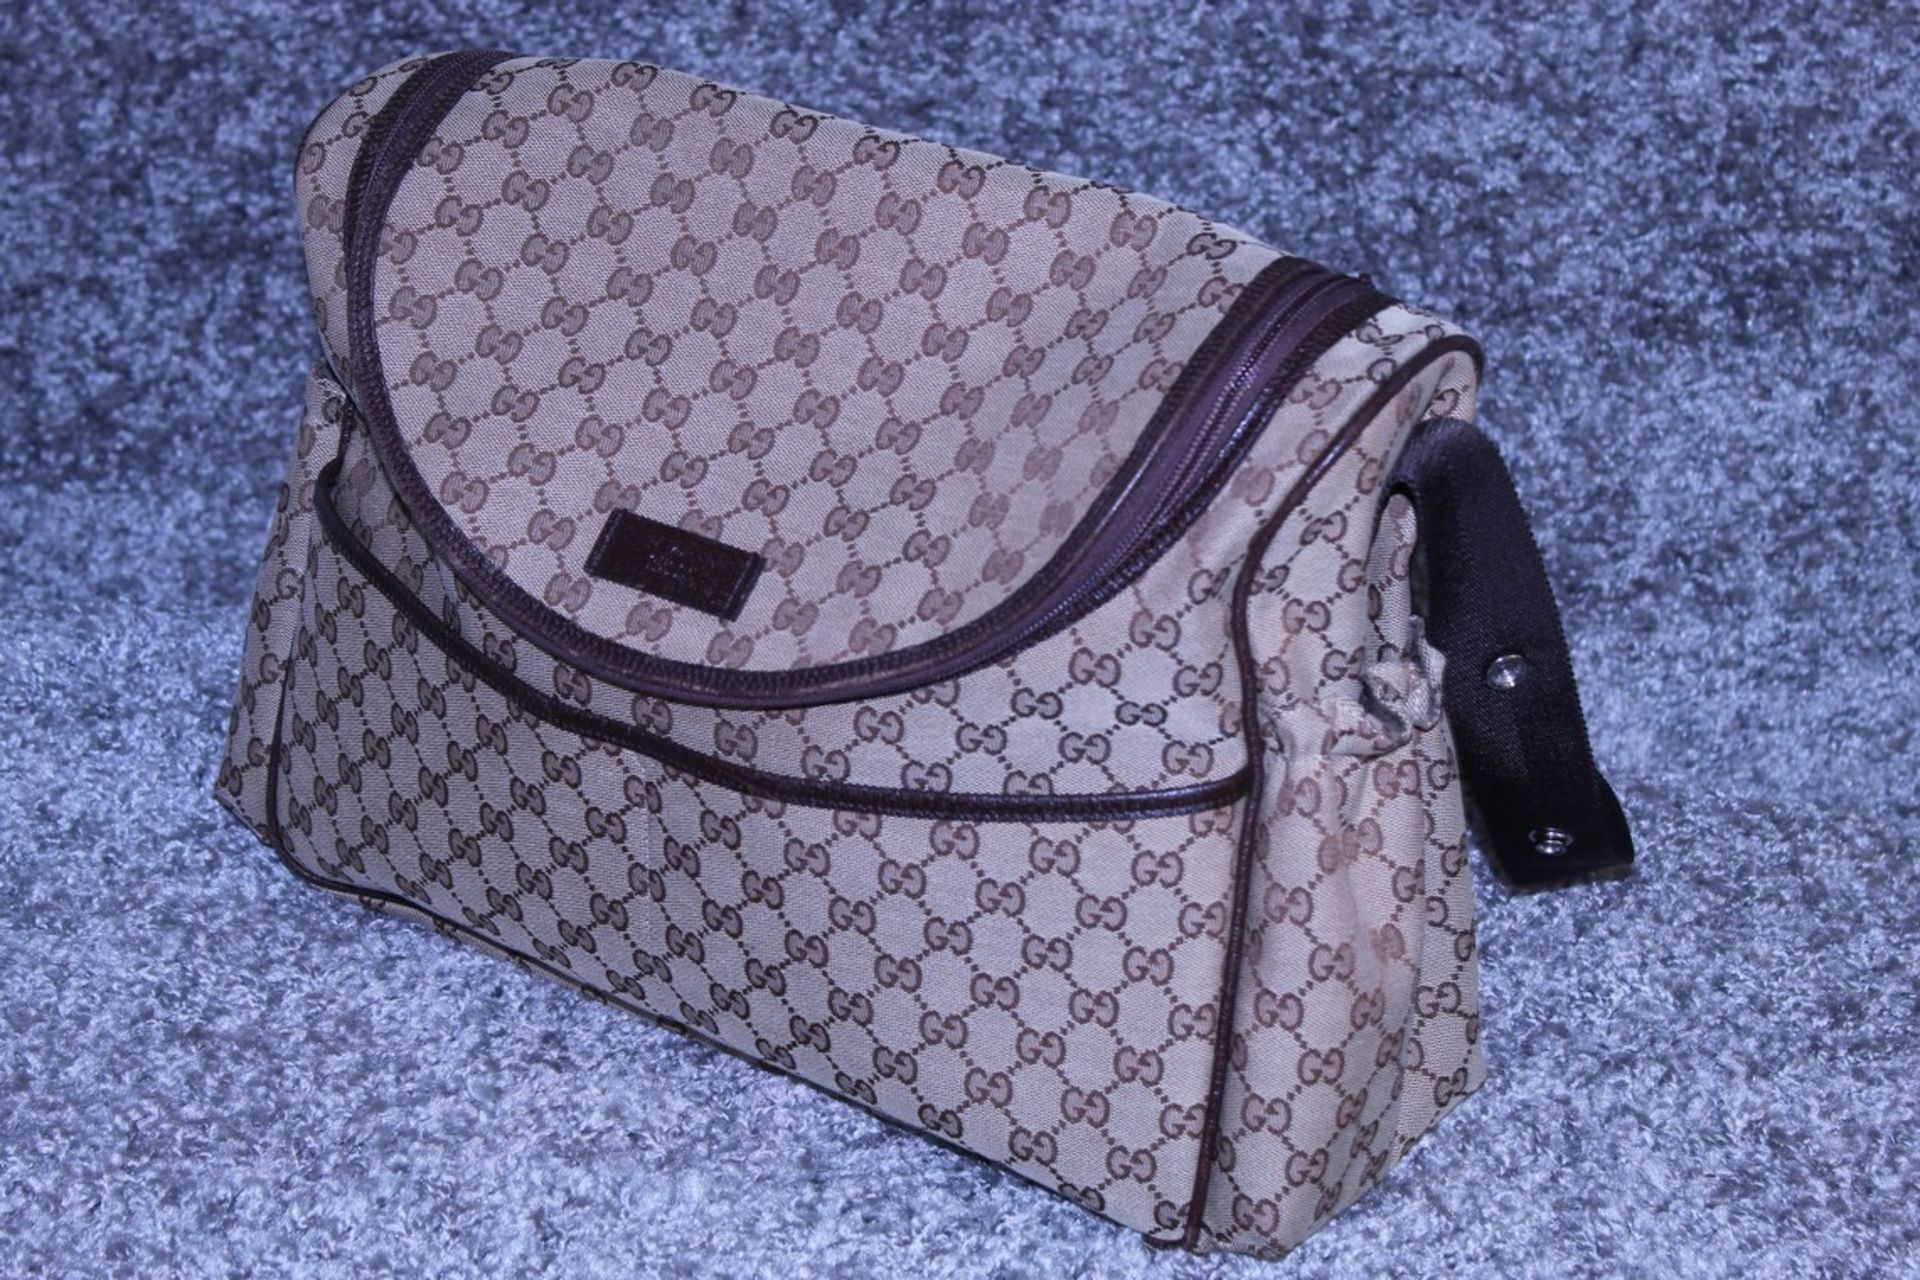 RRP £1,200 Gucci Original Diaper Bag, Beige/Dark Brown Monogramme Canvas, 36X28X12Cm (Production - Image 3 of 5